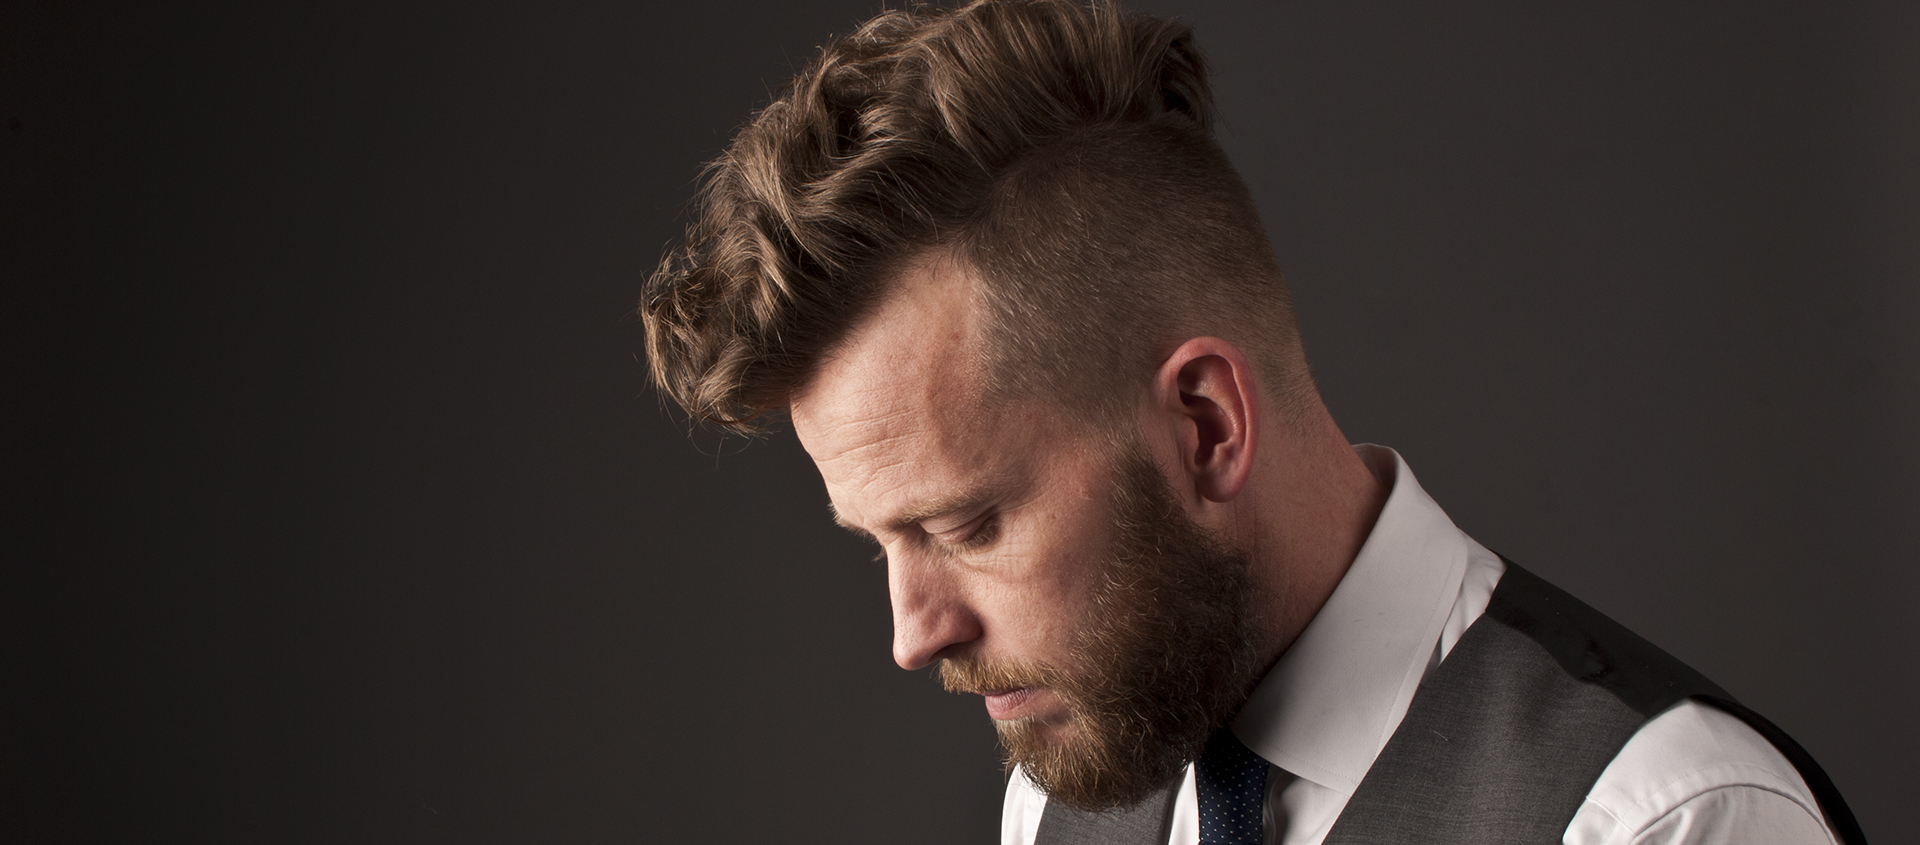 Gentleman&#8217;s <br>Hair styling